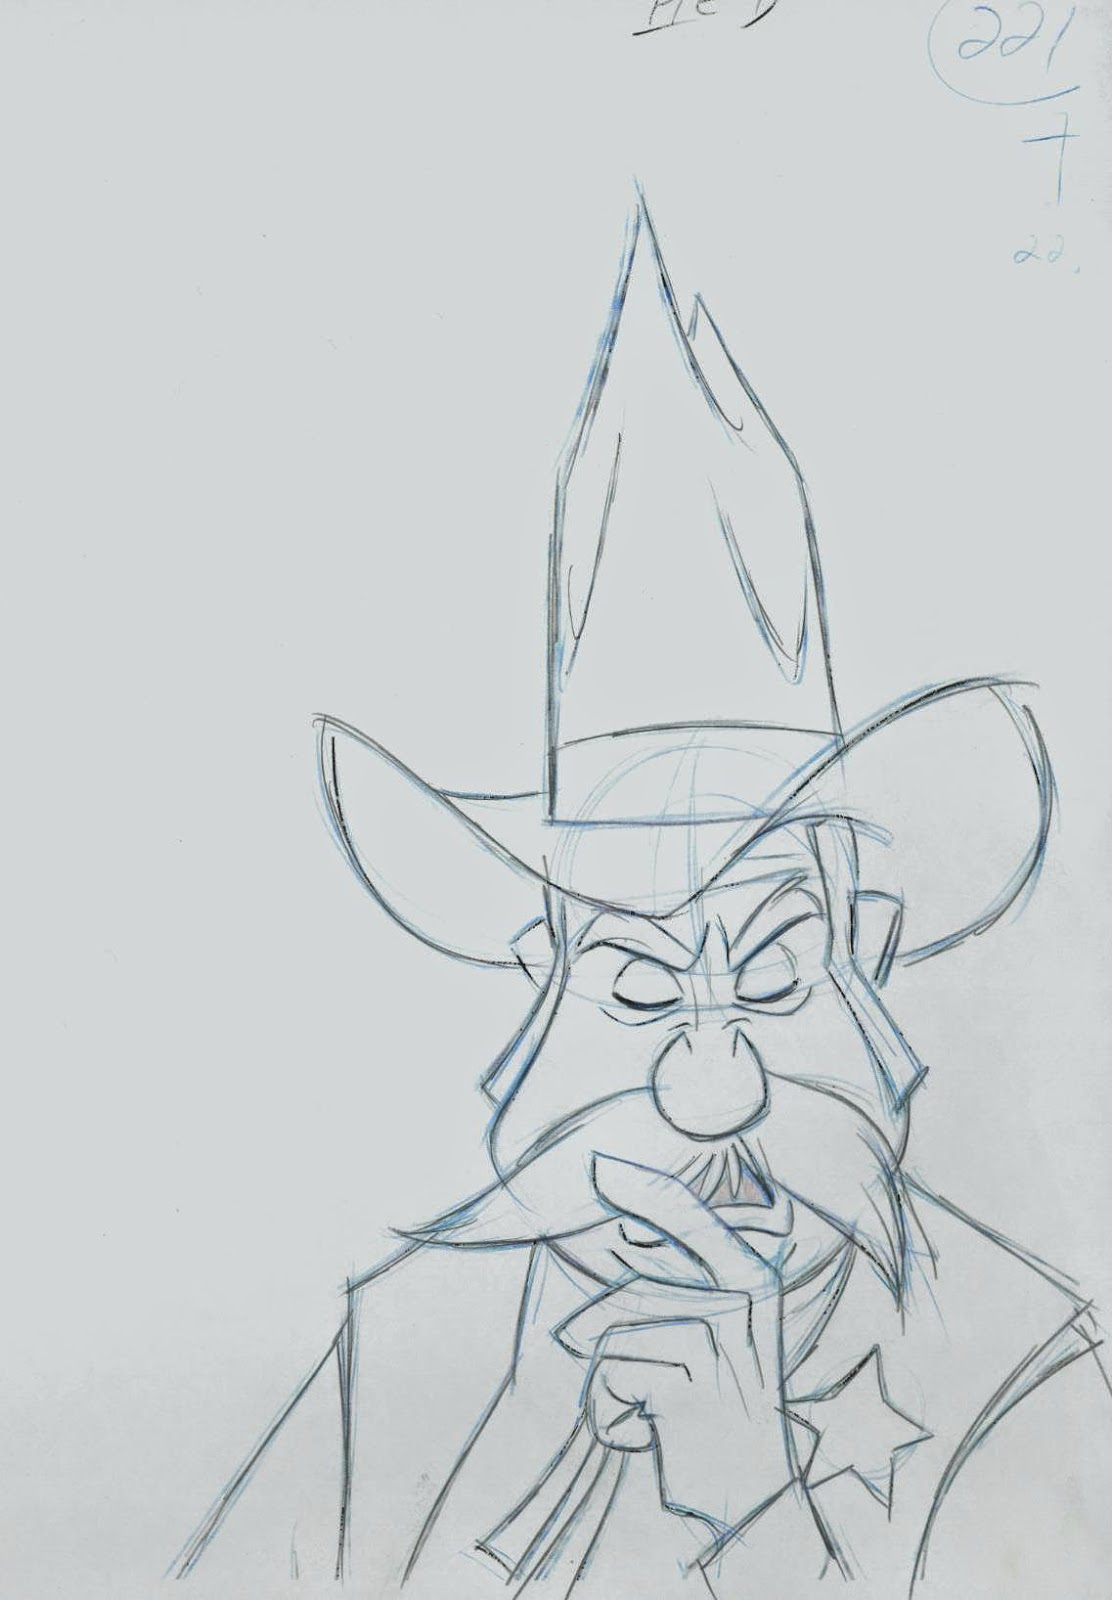 sheriff_24-1.jpg